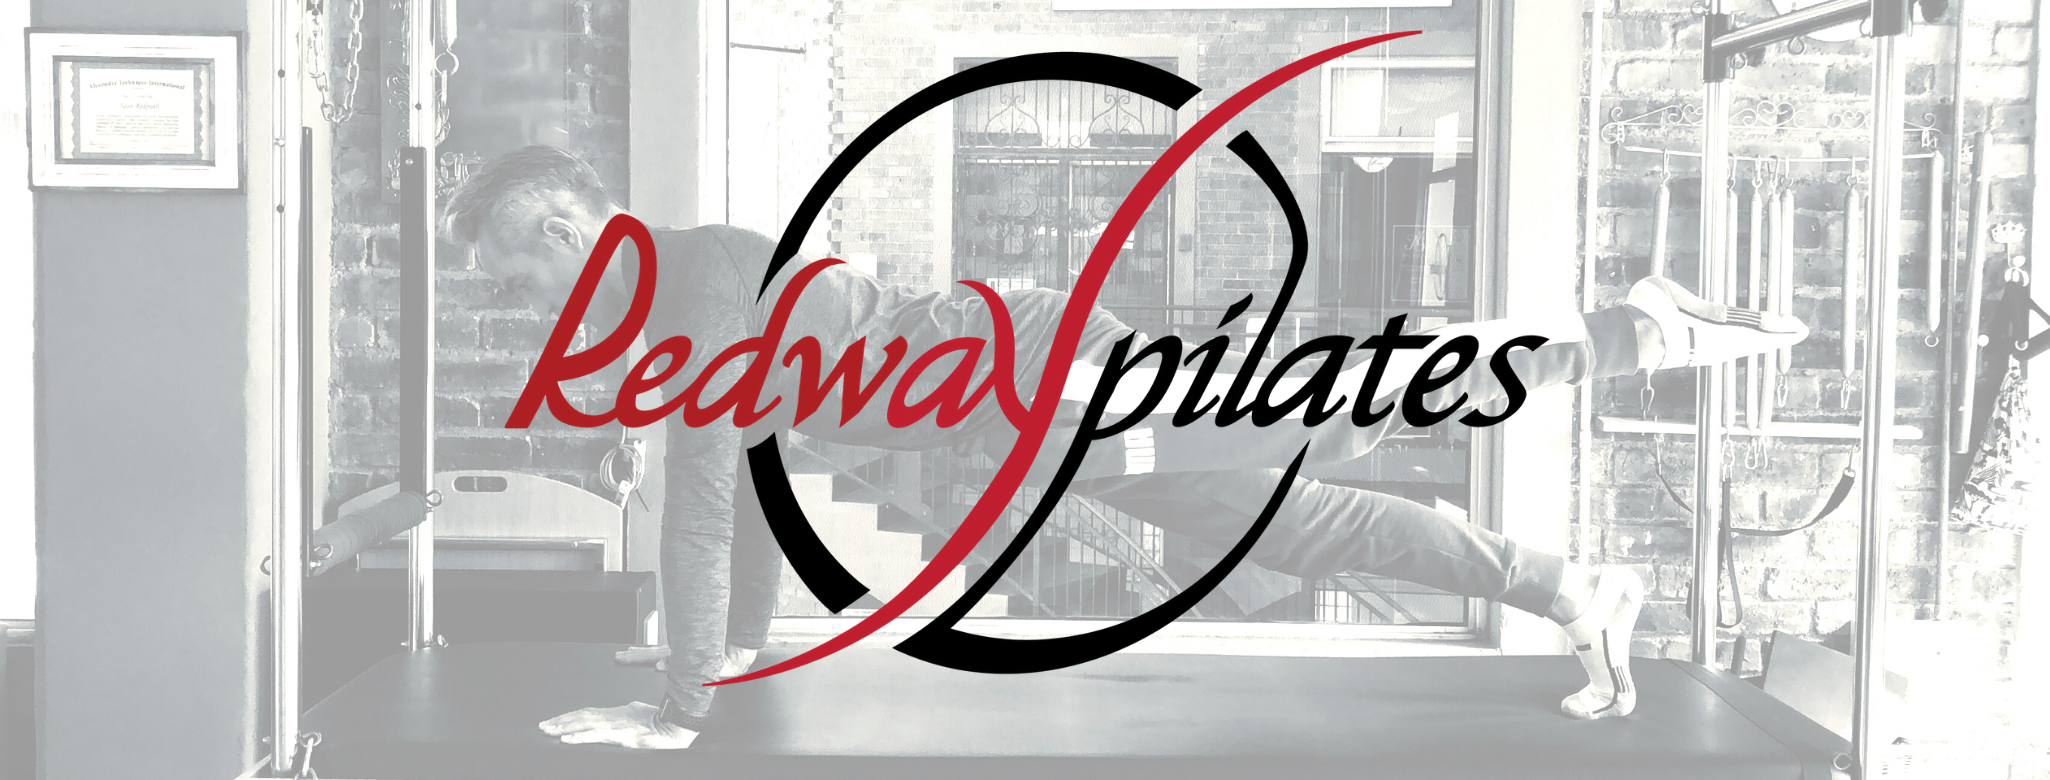 Redway Pilates